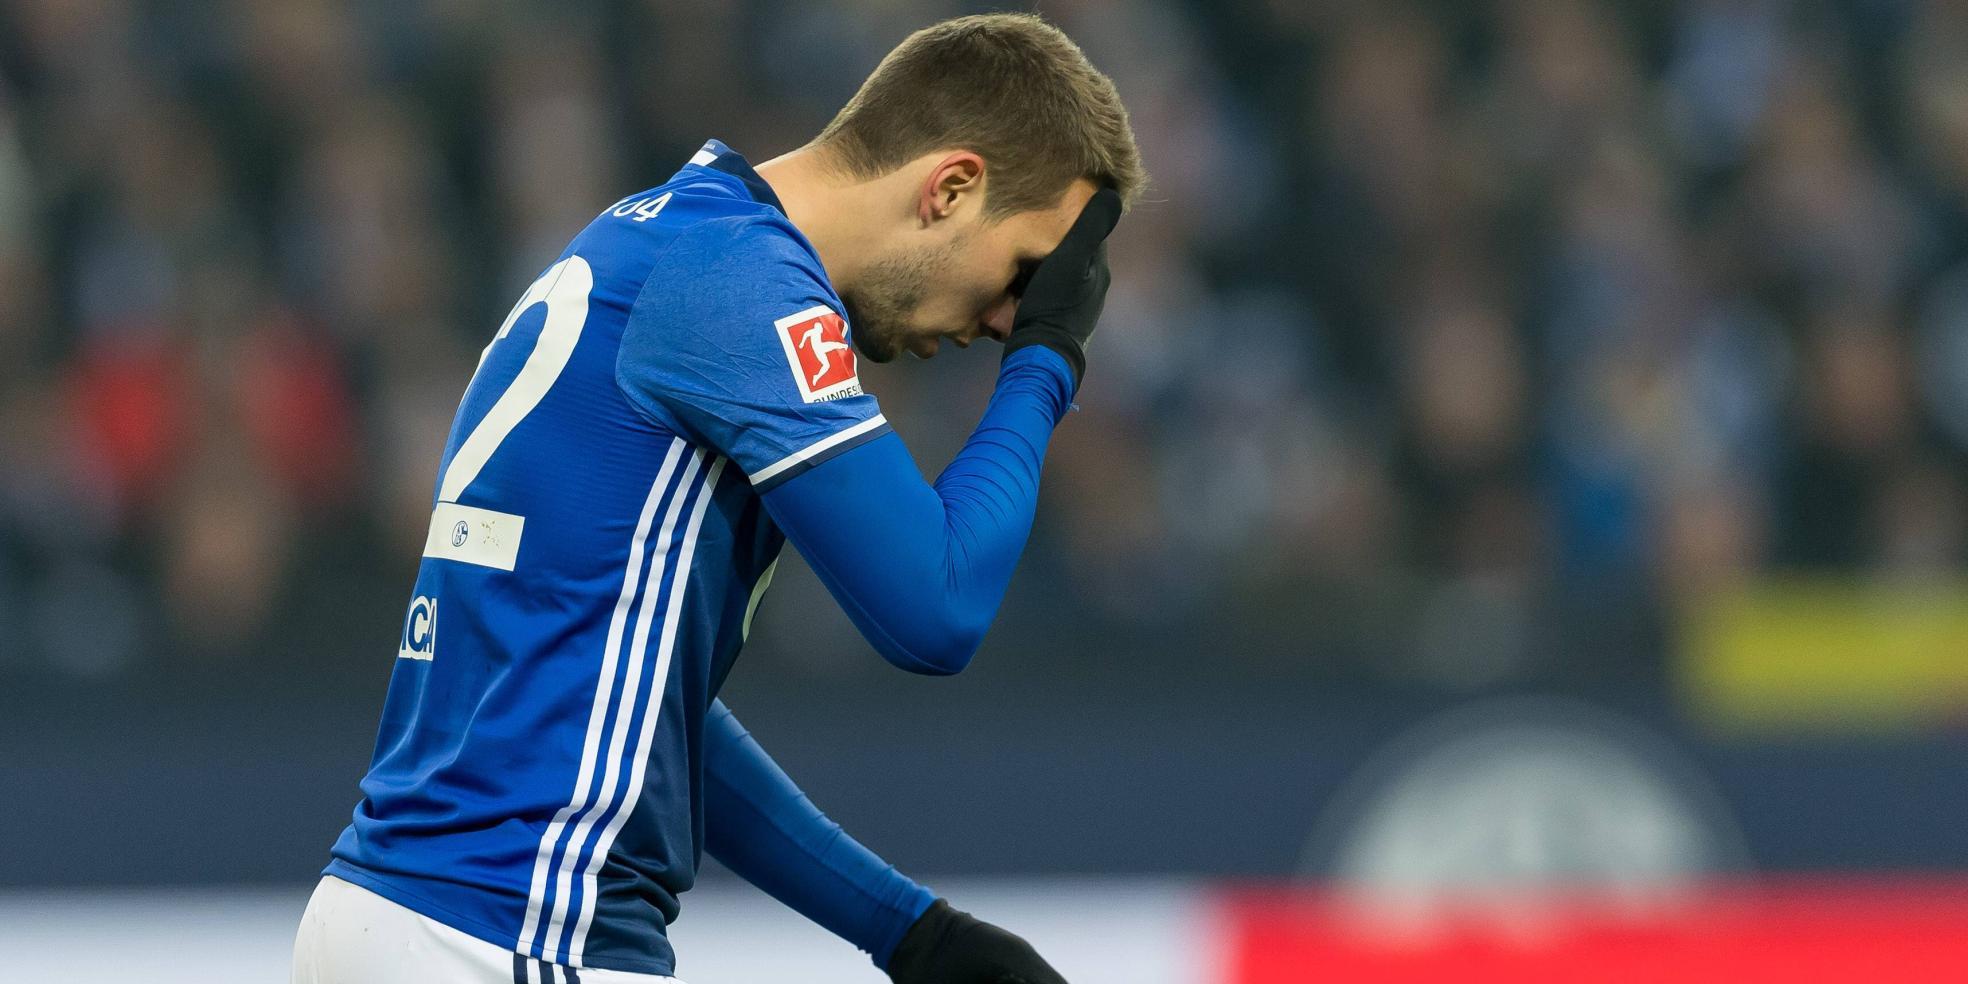 Marko Pjaca vom FC Schalke 04